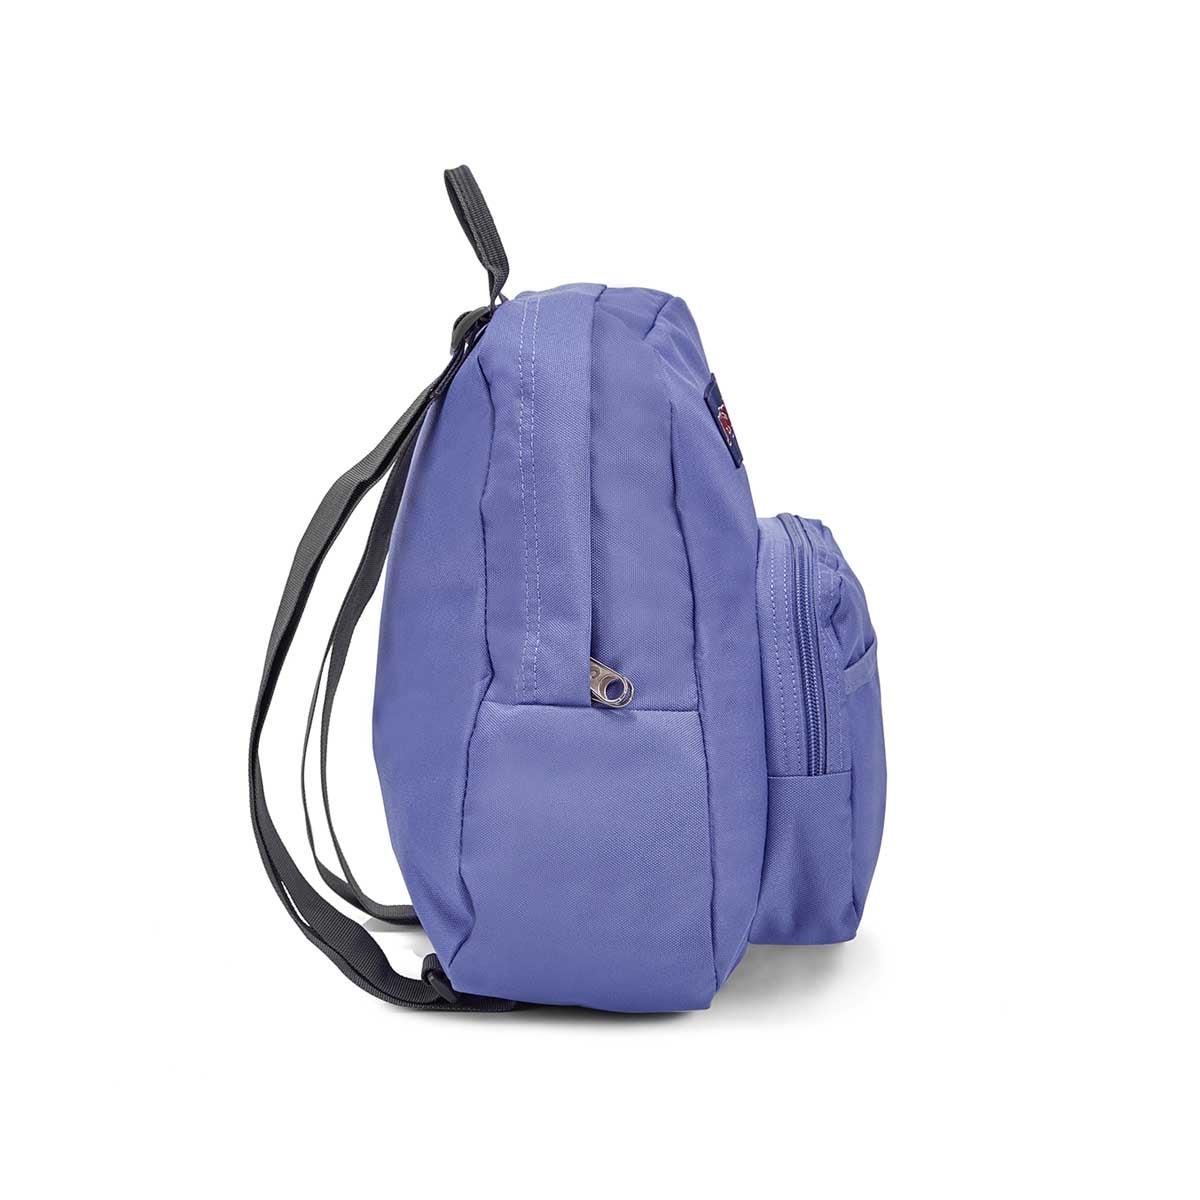 Jansport Half Pint bleached dnm backpack